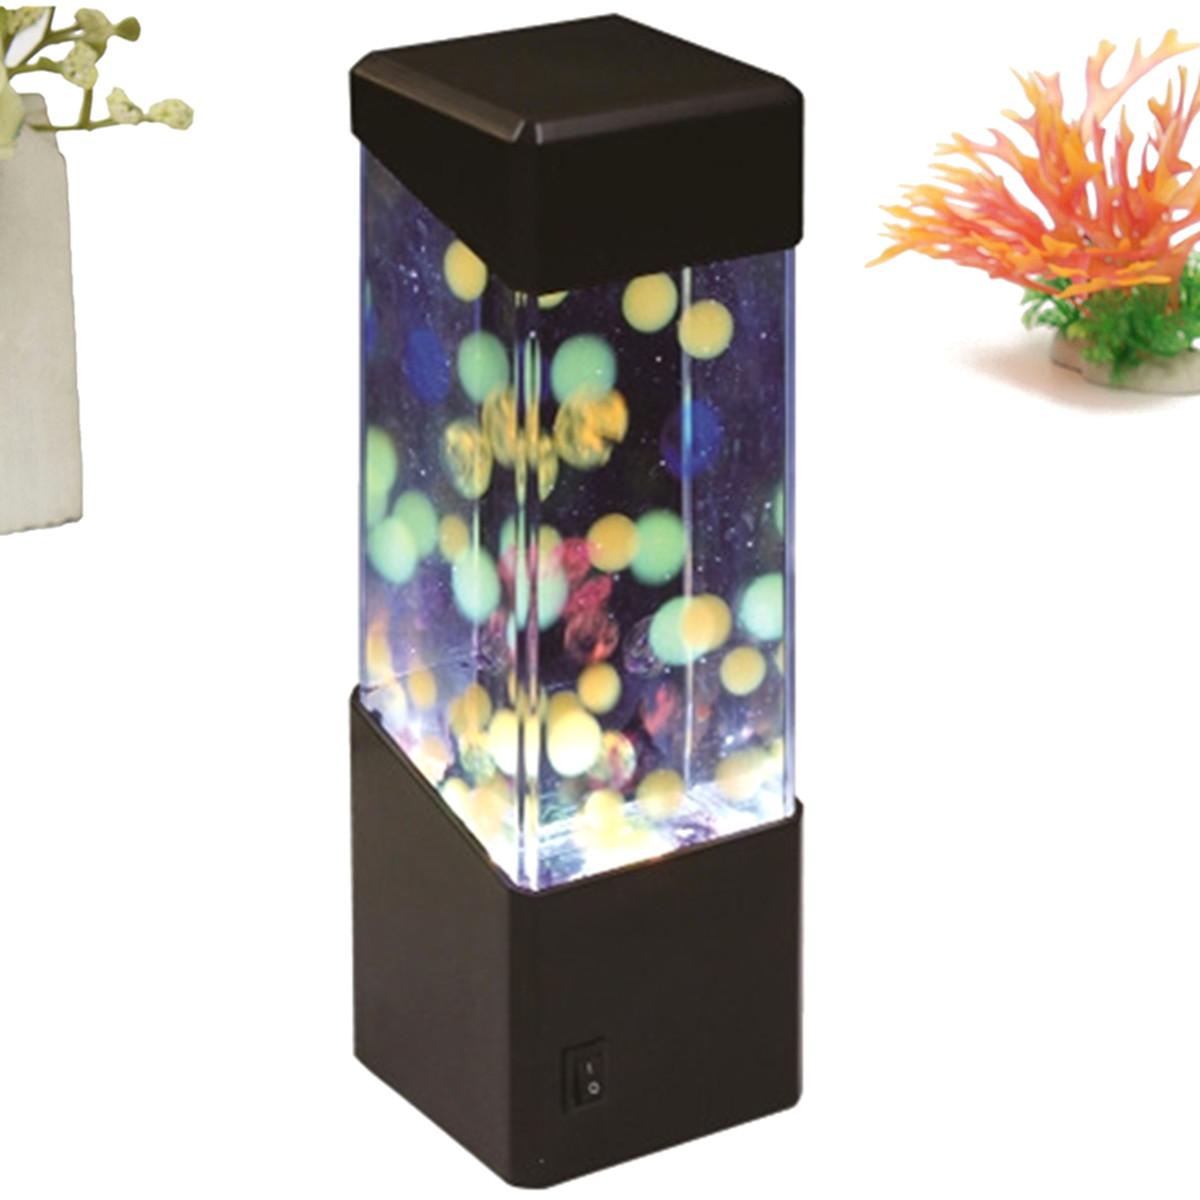 Led aquarium poisson d coration lampe veilleuse design for Poisson decoration aquarium